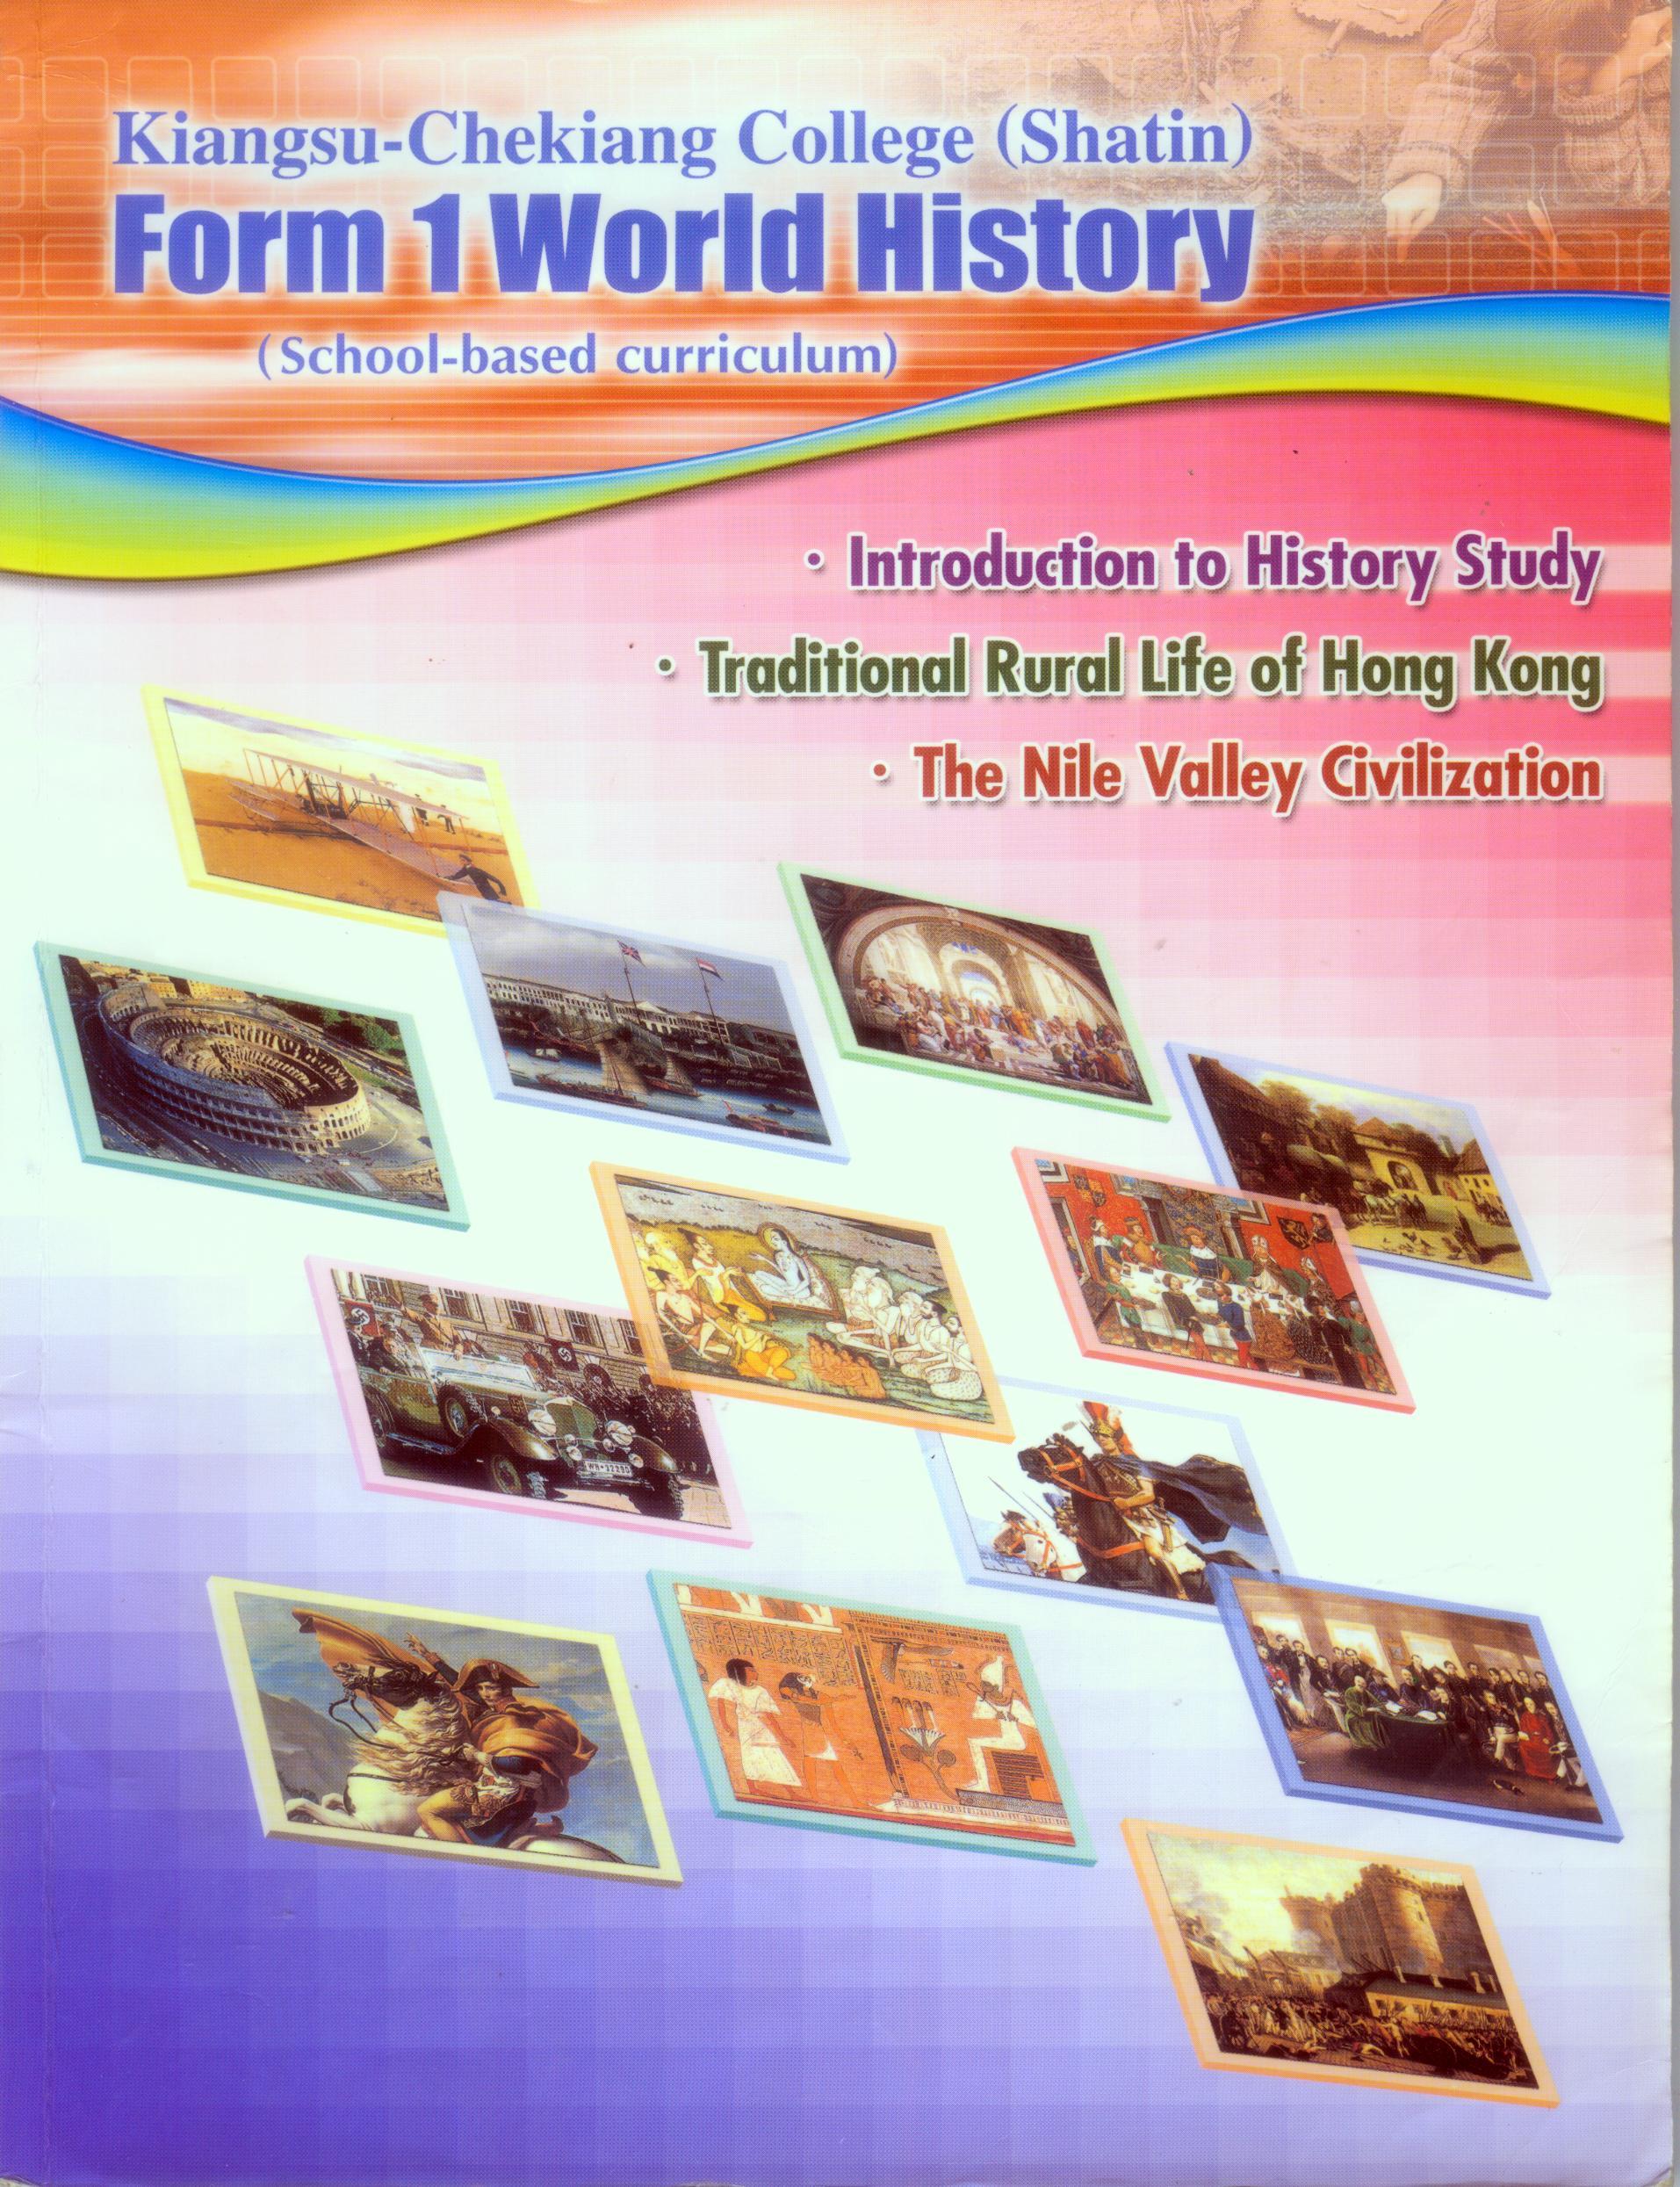 Kiangsu-Chekiang College (Shatin) Form 1 World History